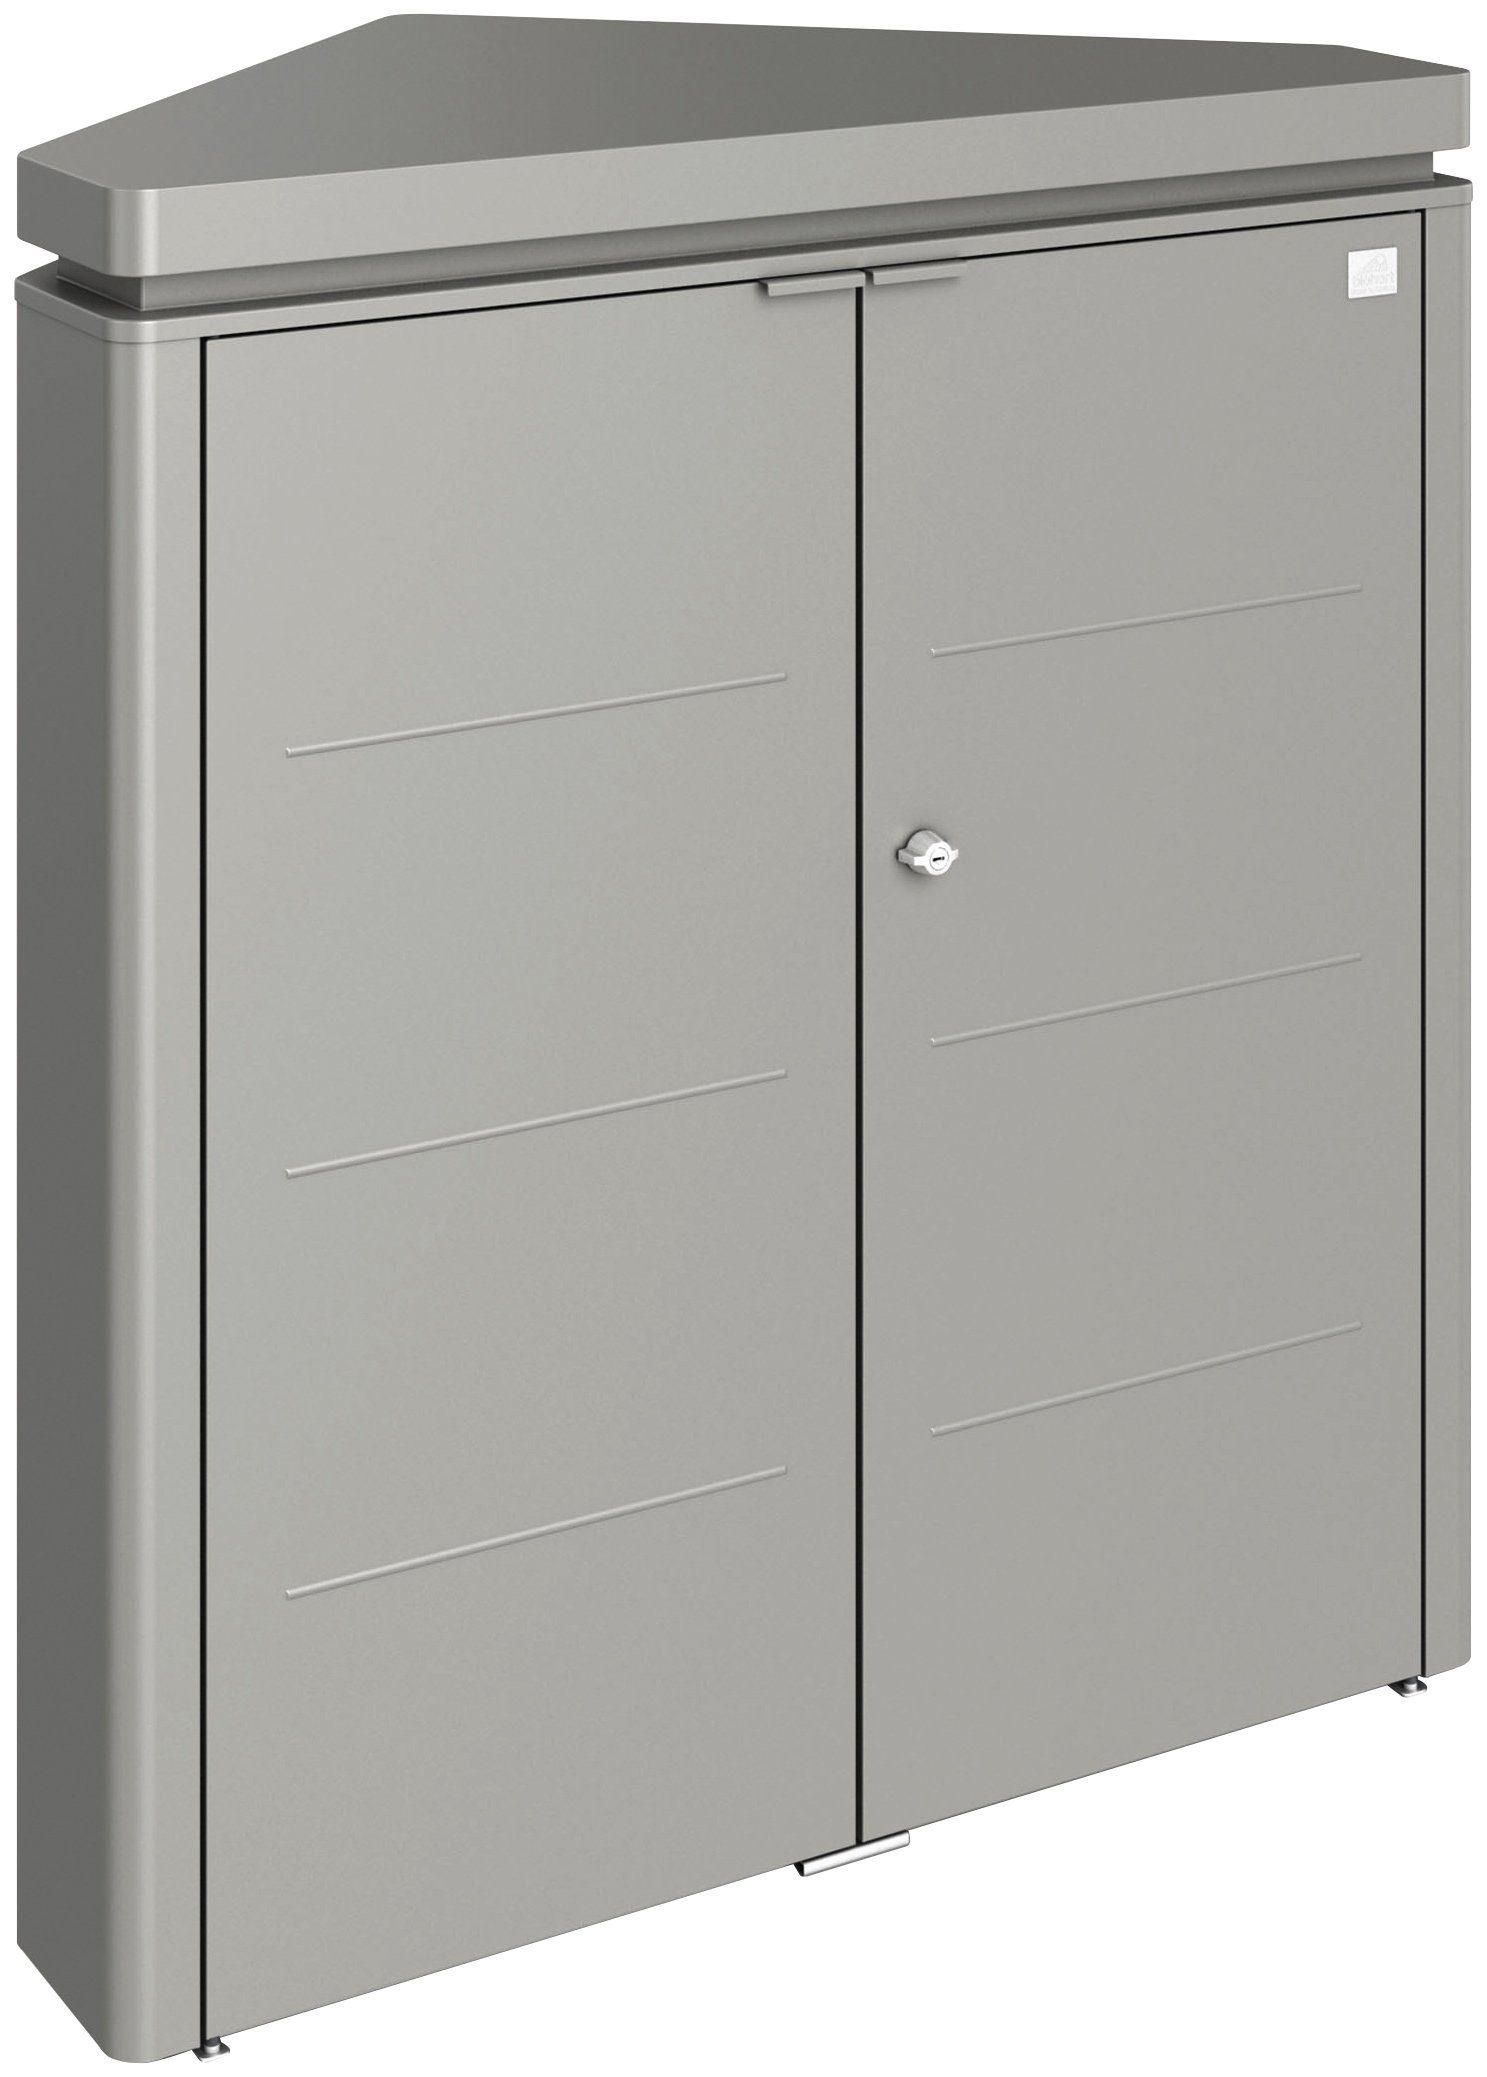 Stahlschrank »CornerBoard«, quarzgrau, BxTxH: 117x76x127 cm